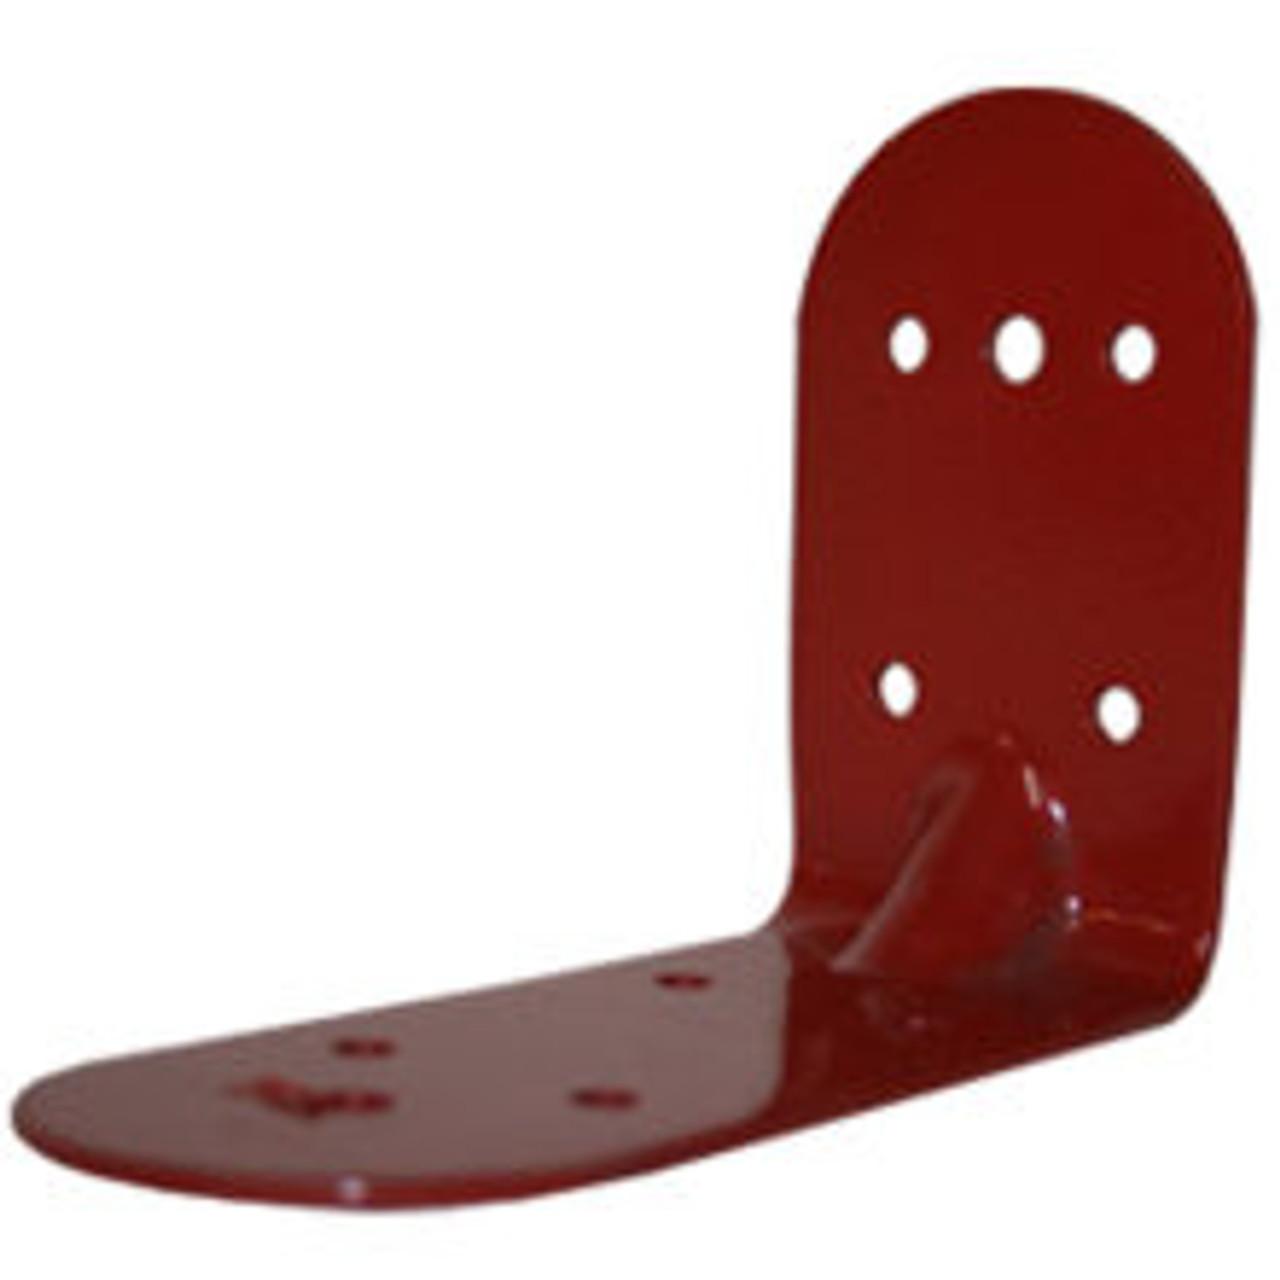 Ziamatic Bracket - Red PVC coated NCM-BR